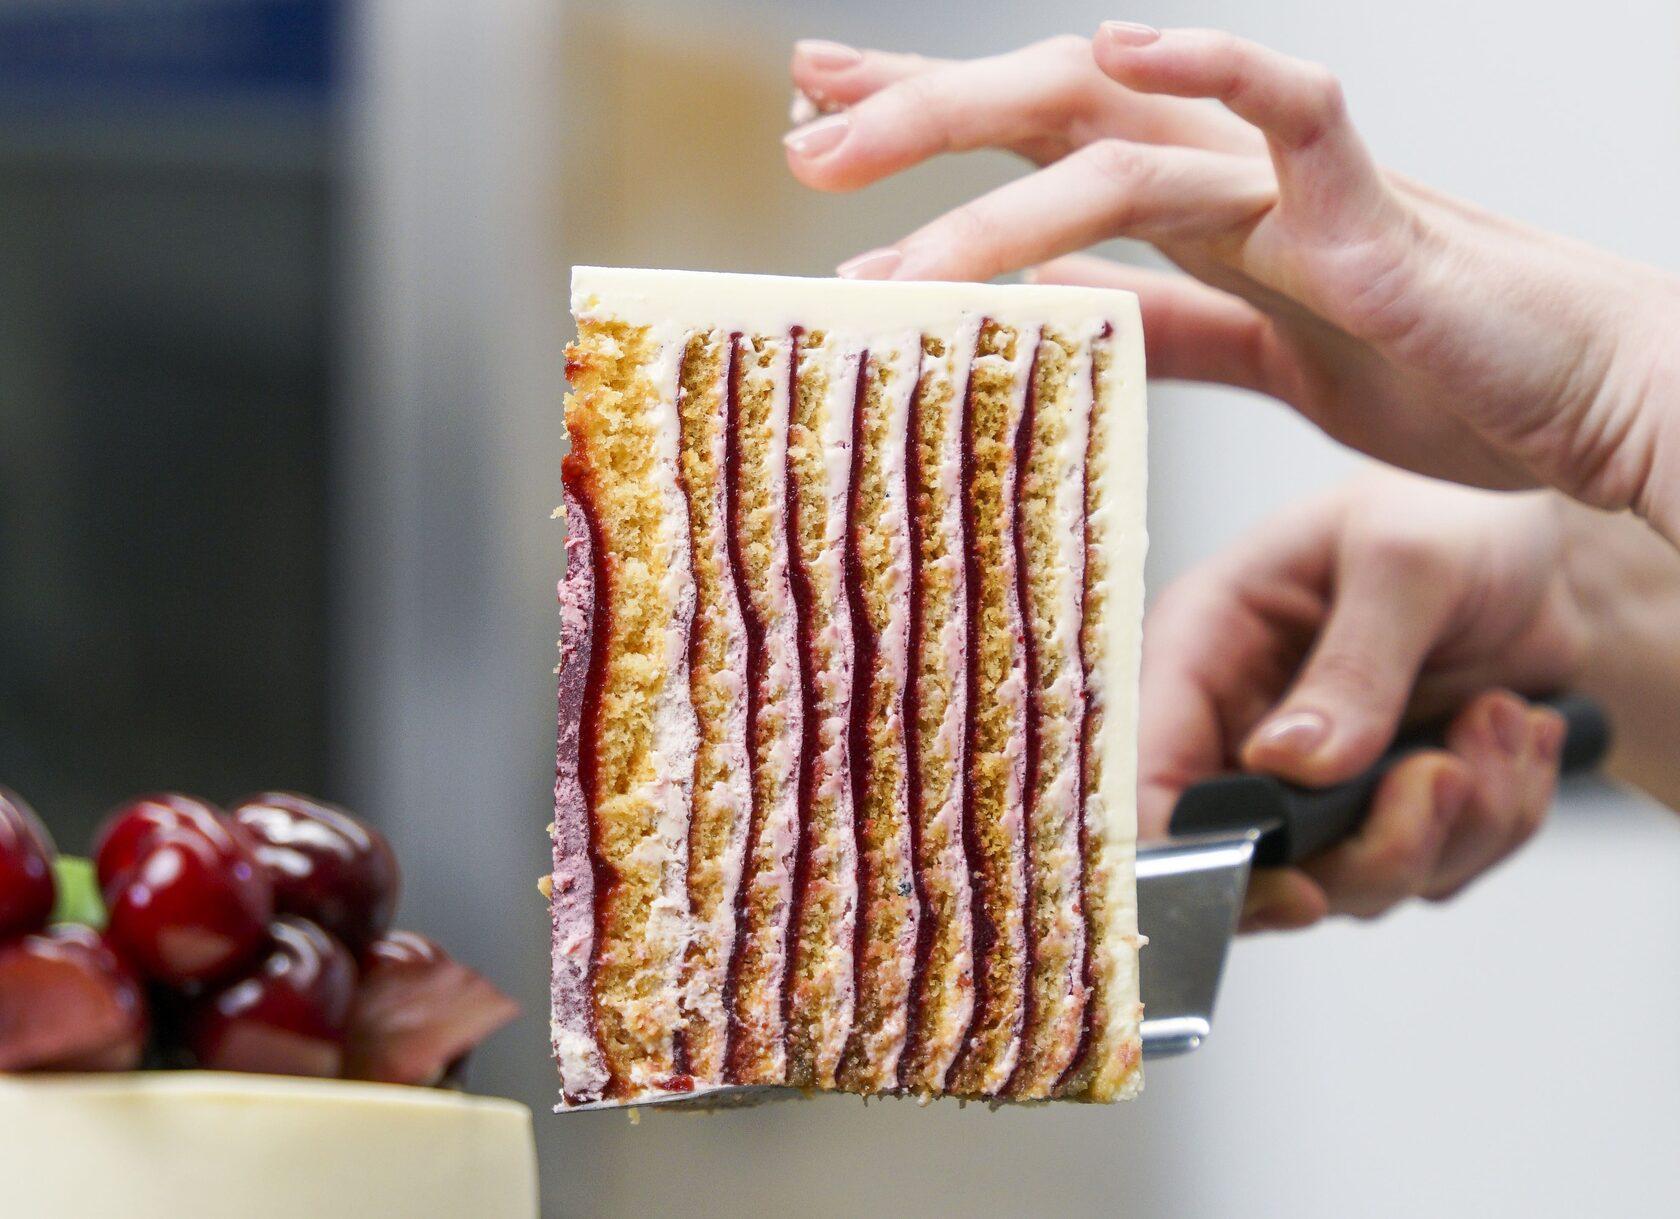 Cherry Velvet vertical layer cake cut photo